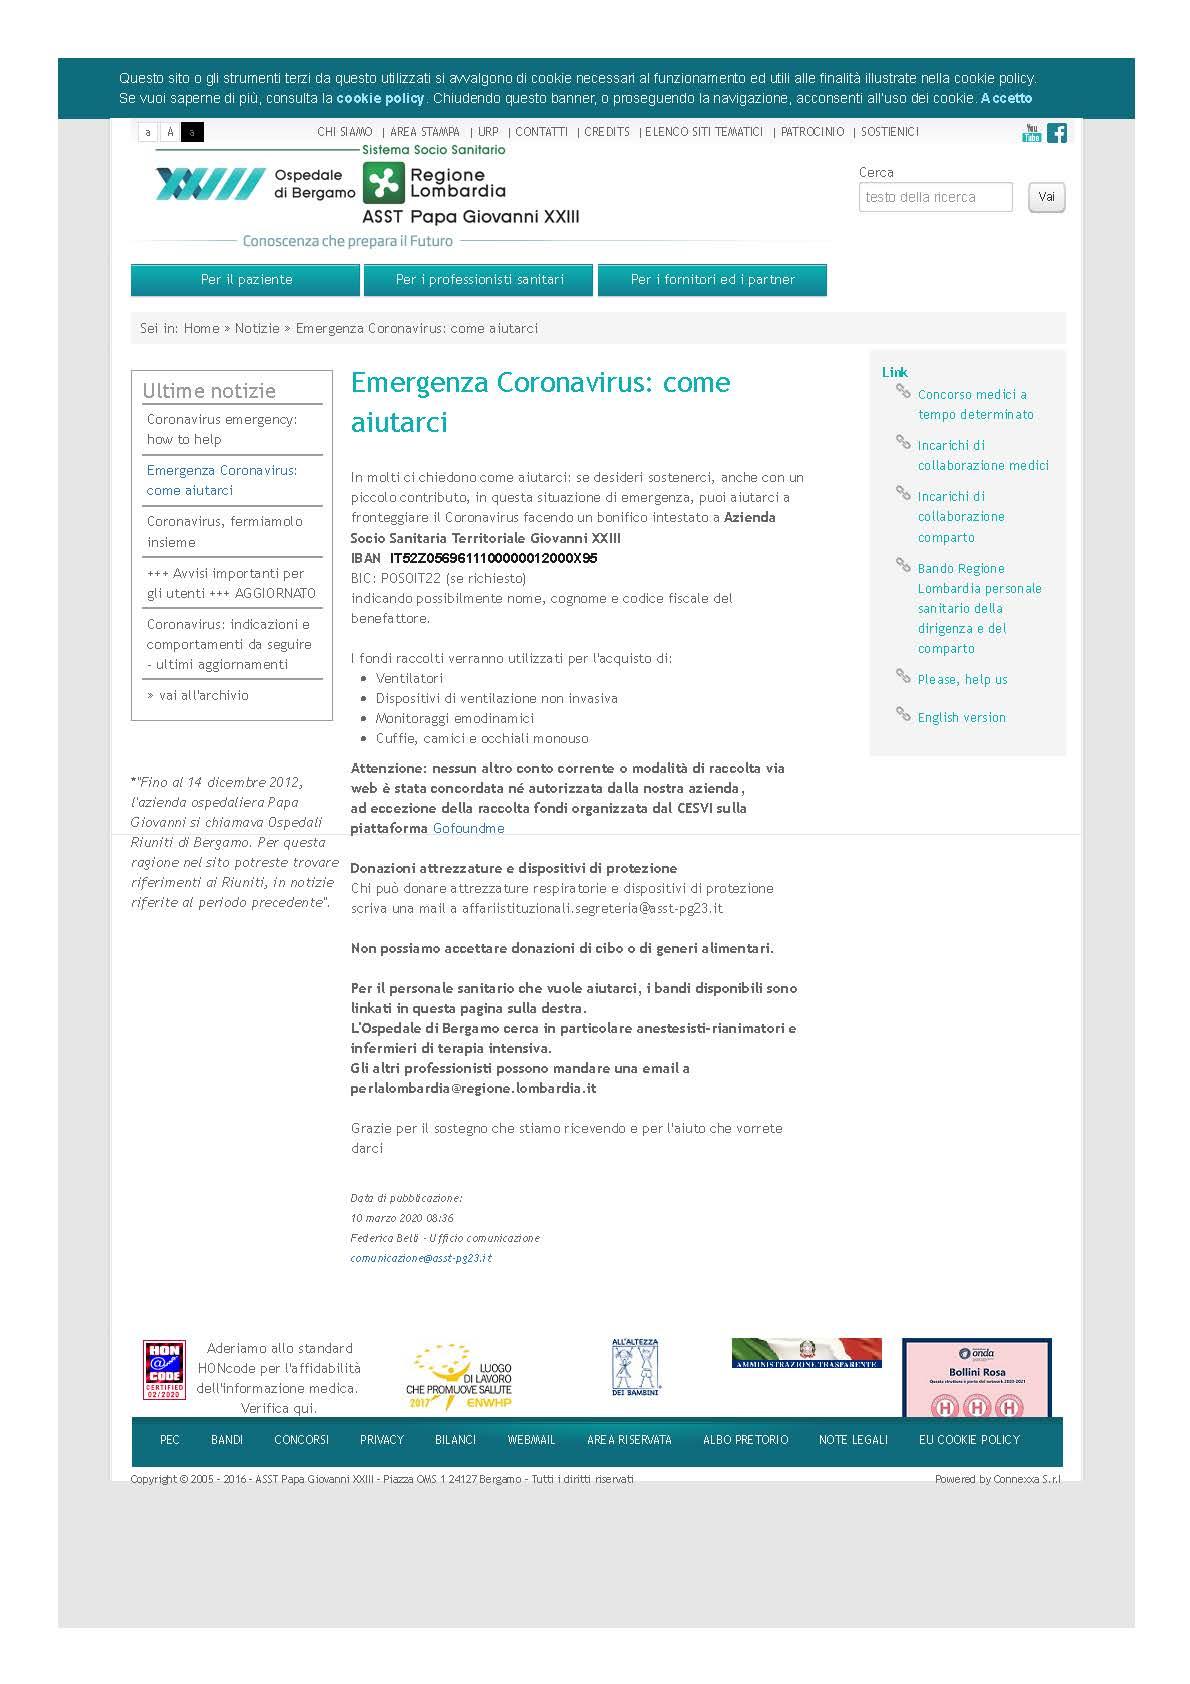 Cura e Ricerca _ Emergenza Coronavirus_ come aiutarci